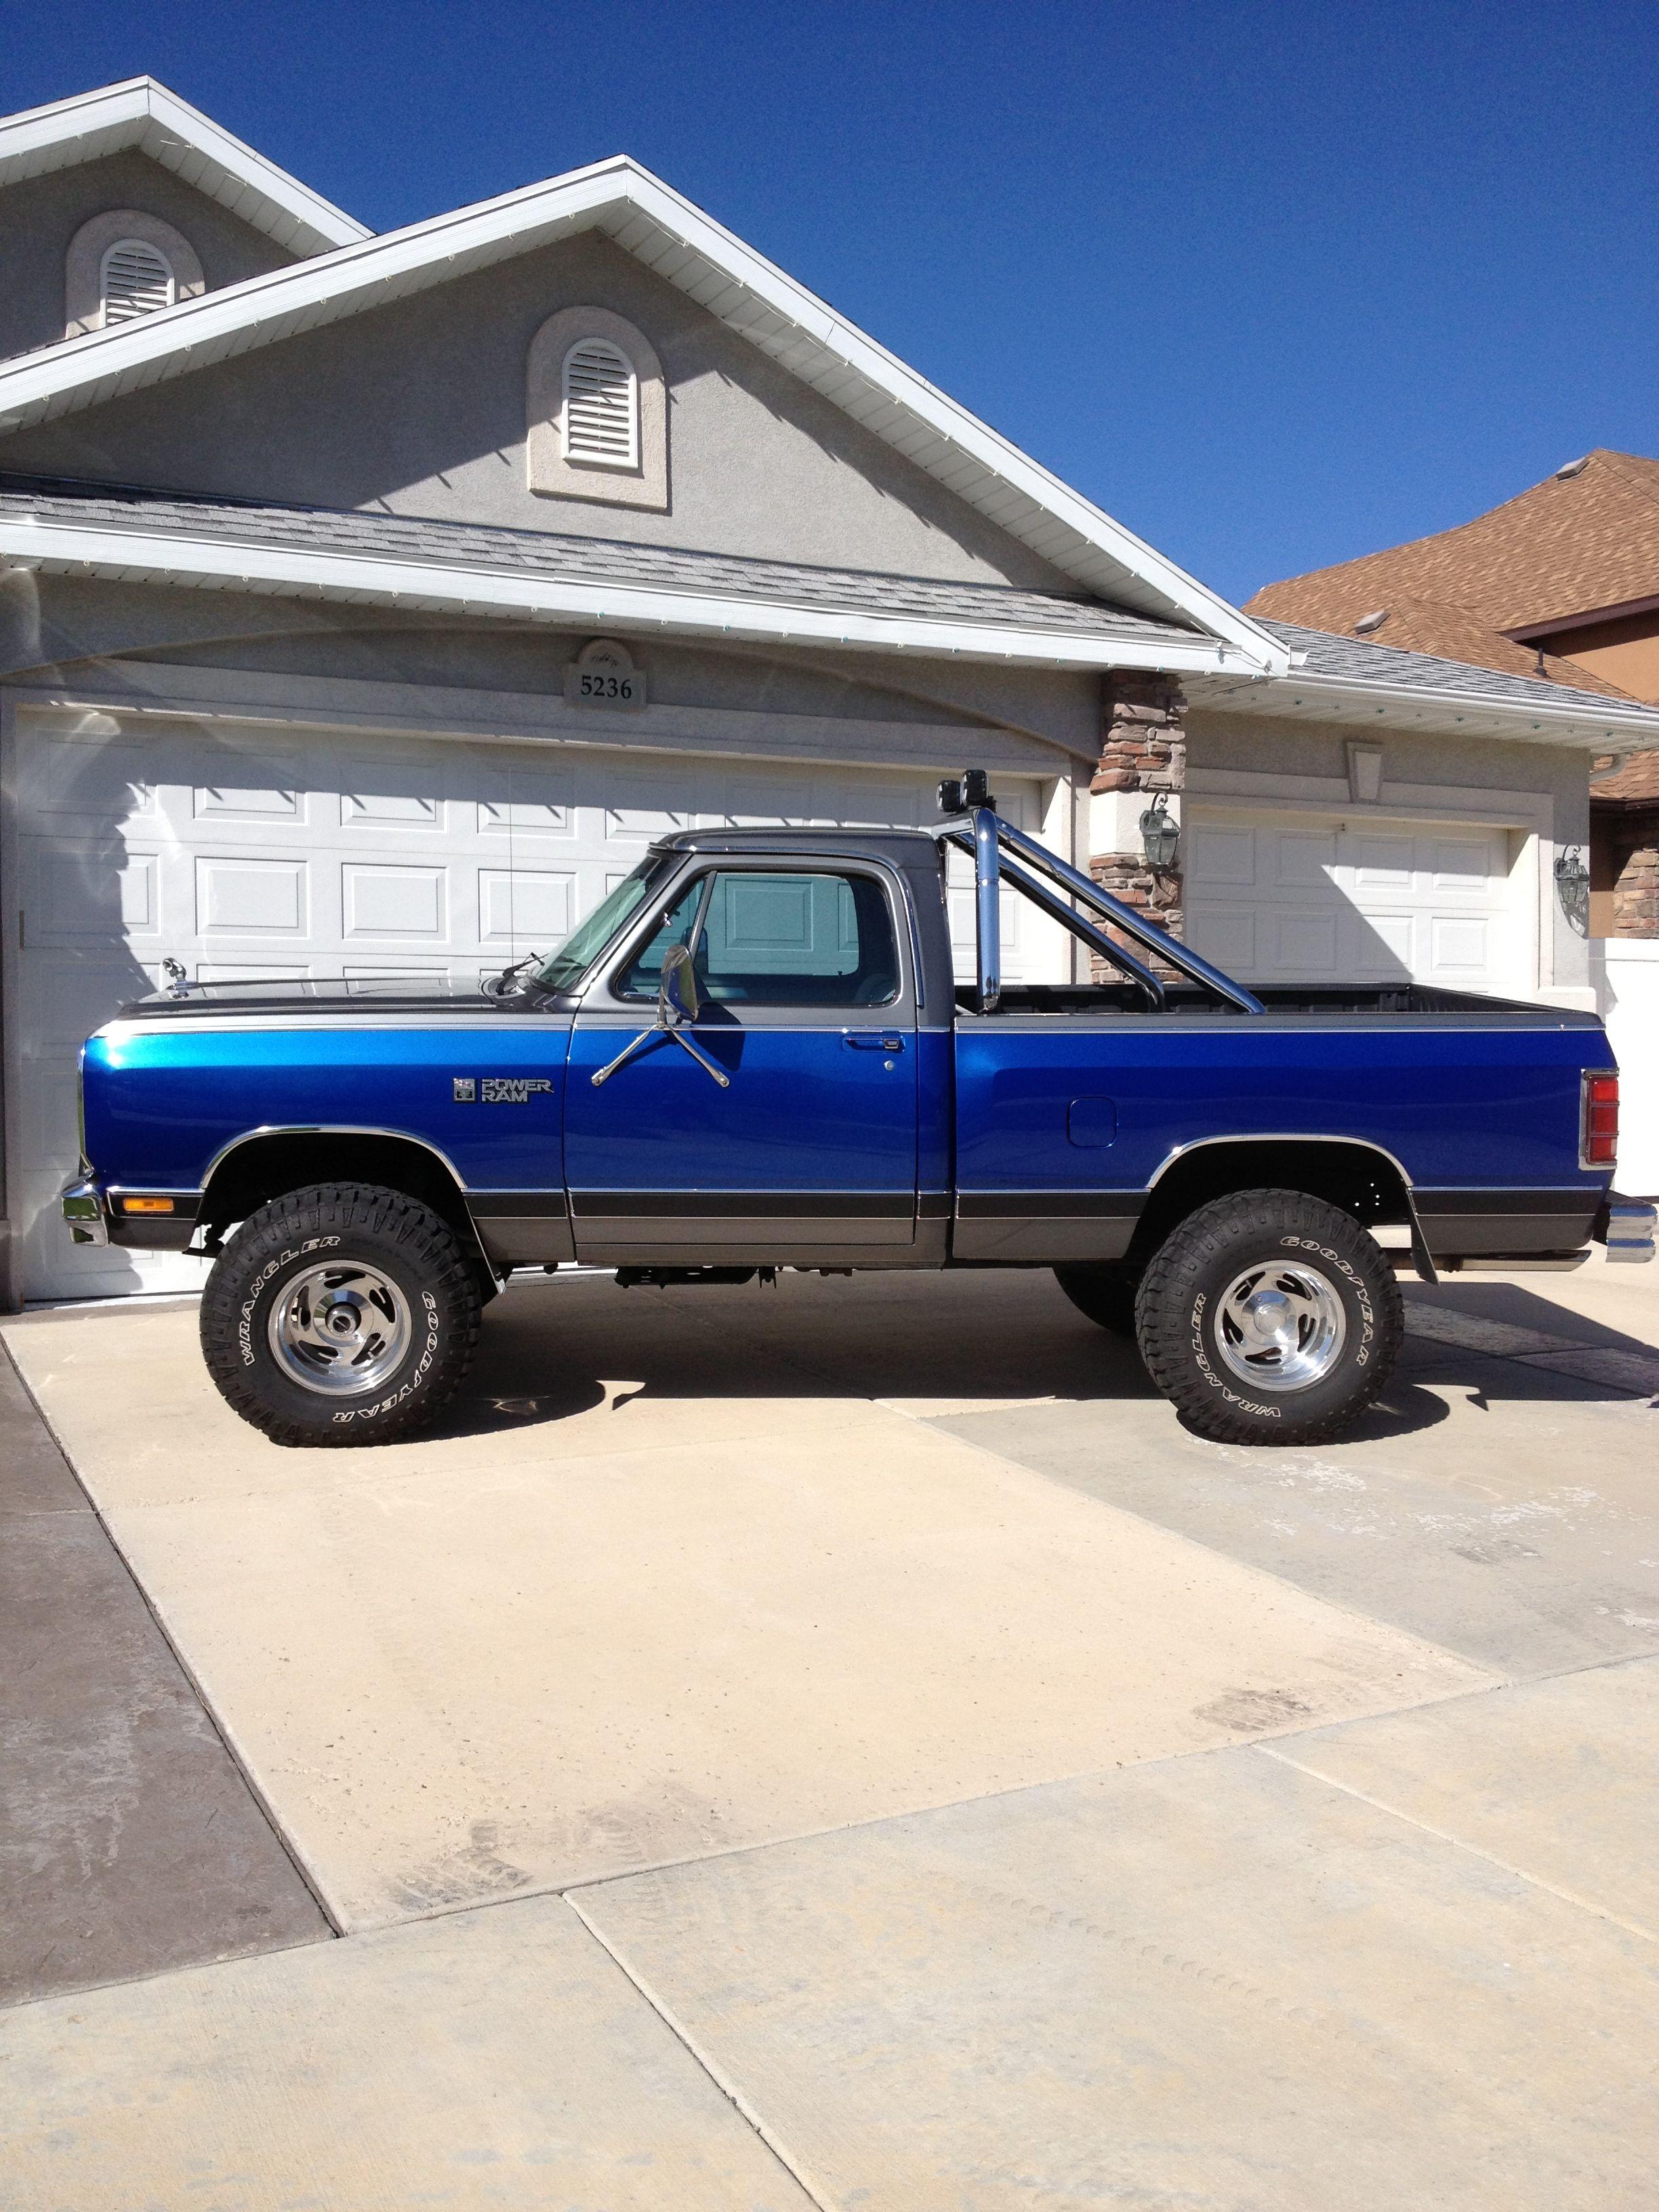 My 85 dodge truck